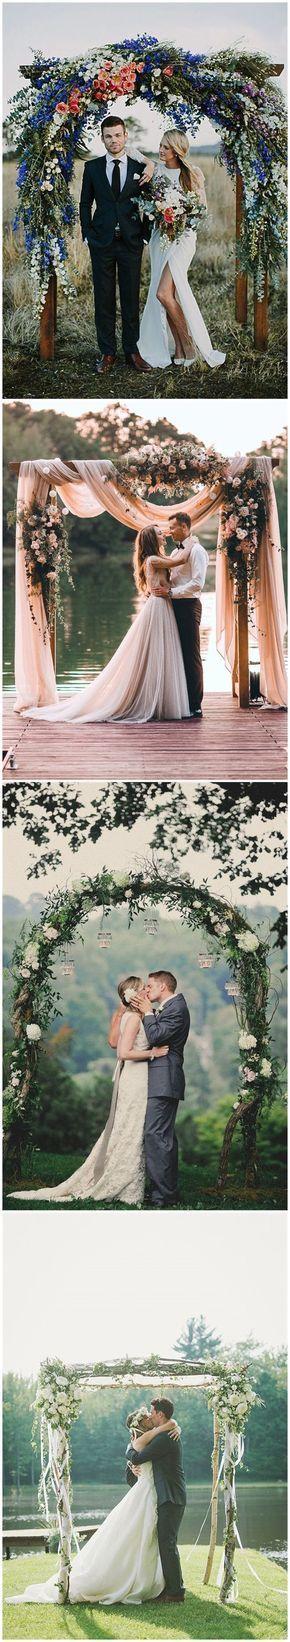 Floral wedding arches